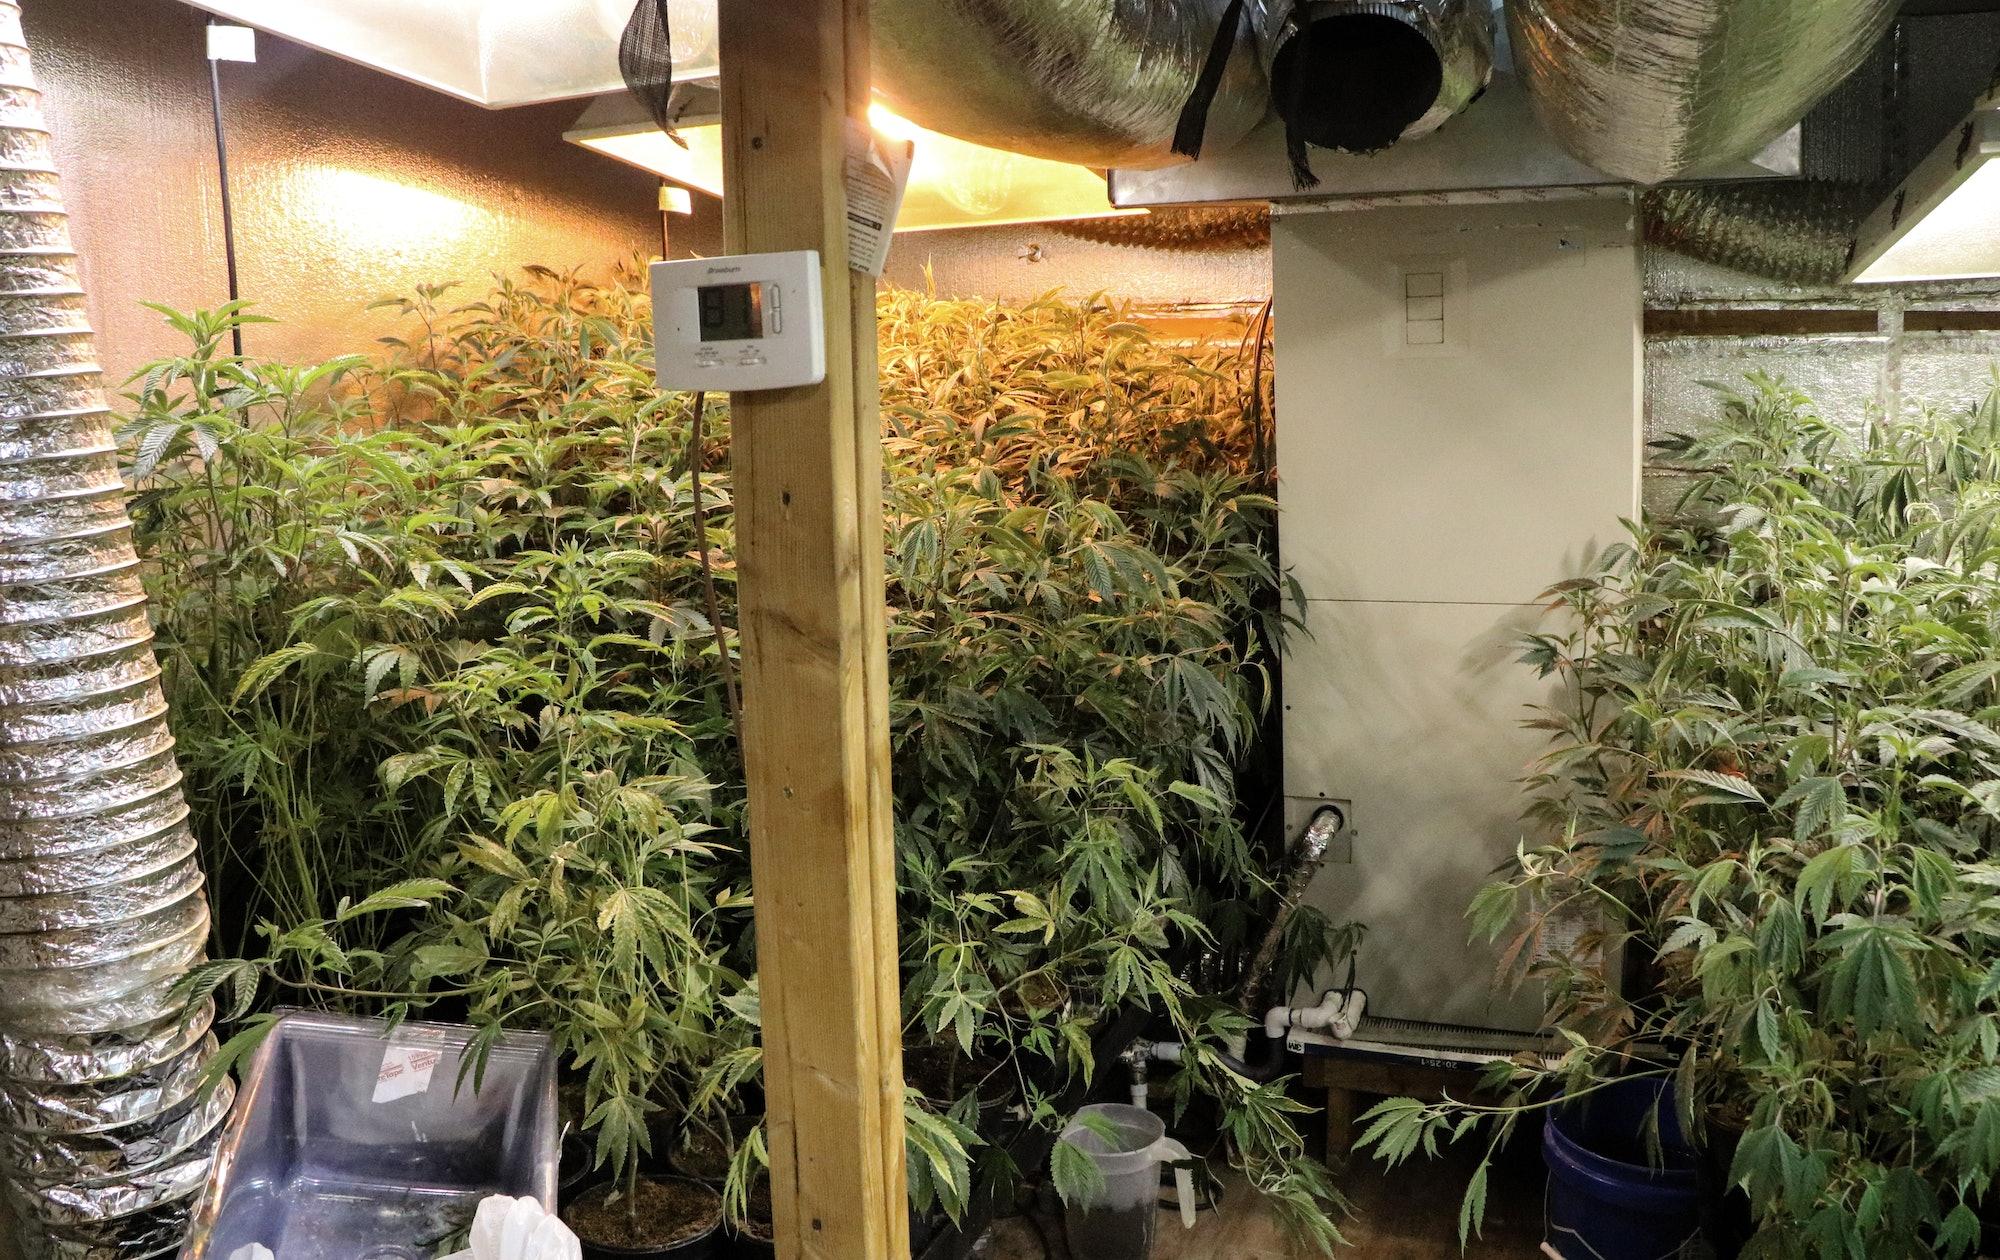 Bortac breach a marijuana grow house